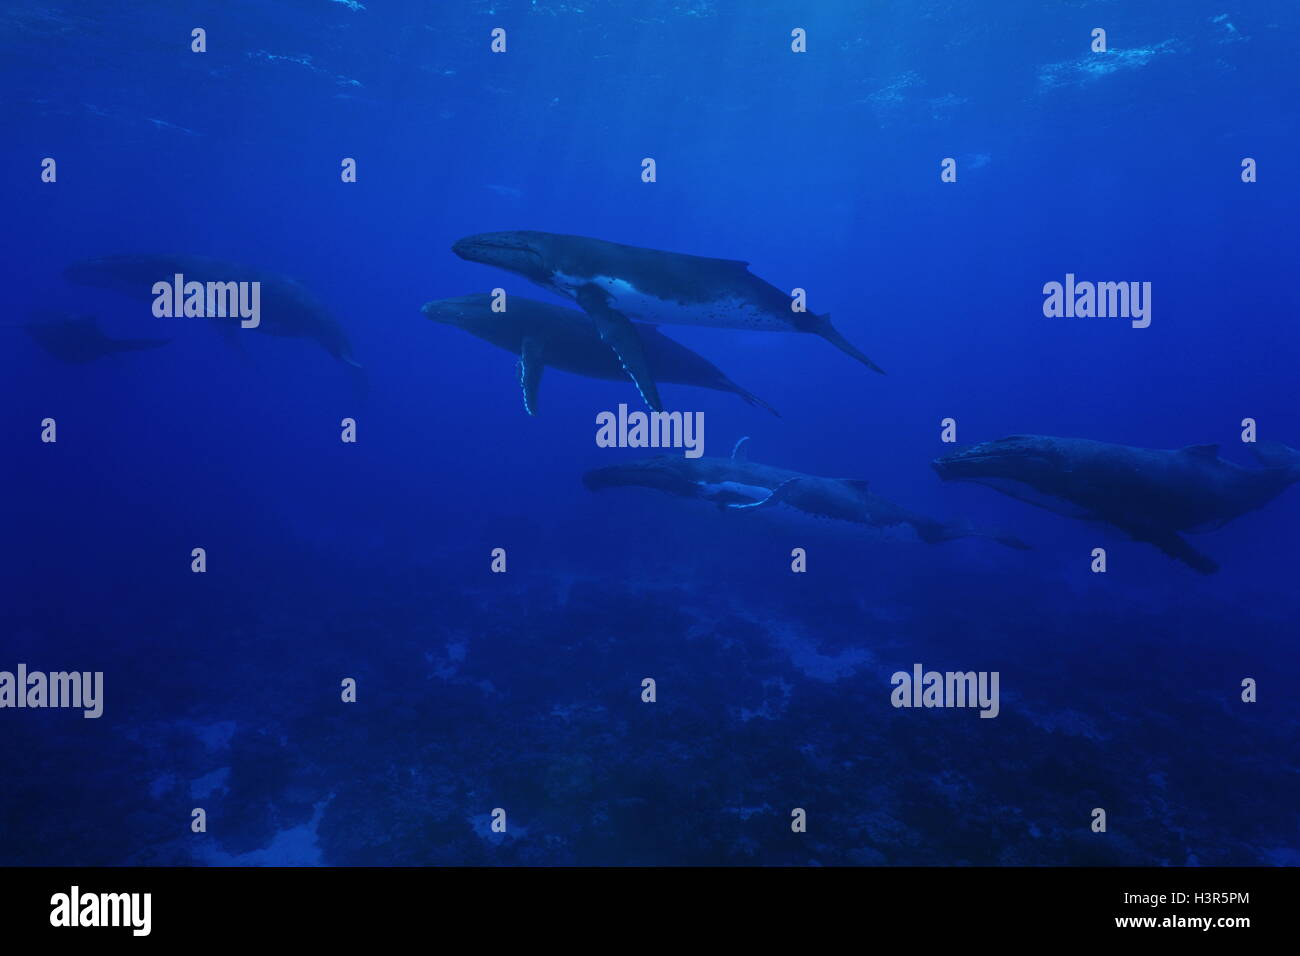 Grupo de ballenas jorobadas Megaptera novaeangliae, submarino en el océano Pacífico, la isla de Rurutu, Austral Polinesia Francesa Foto de stock